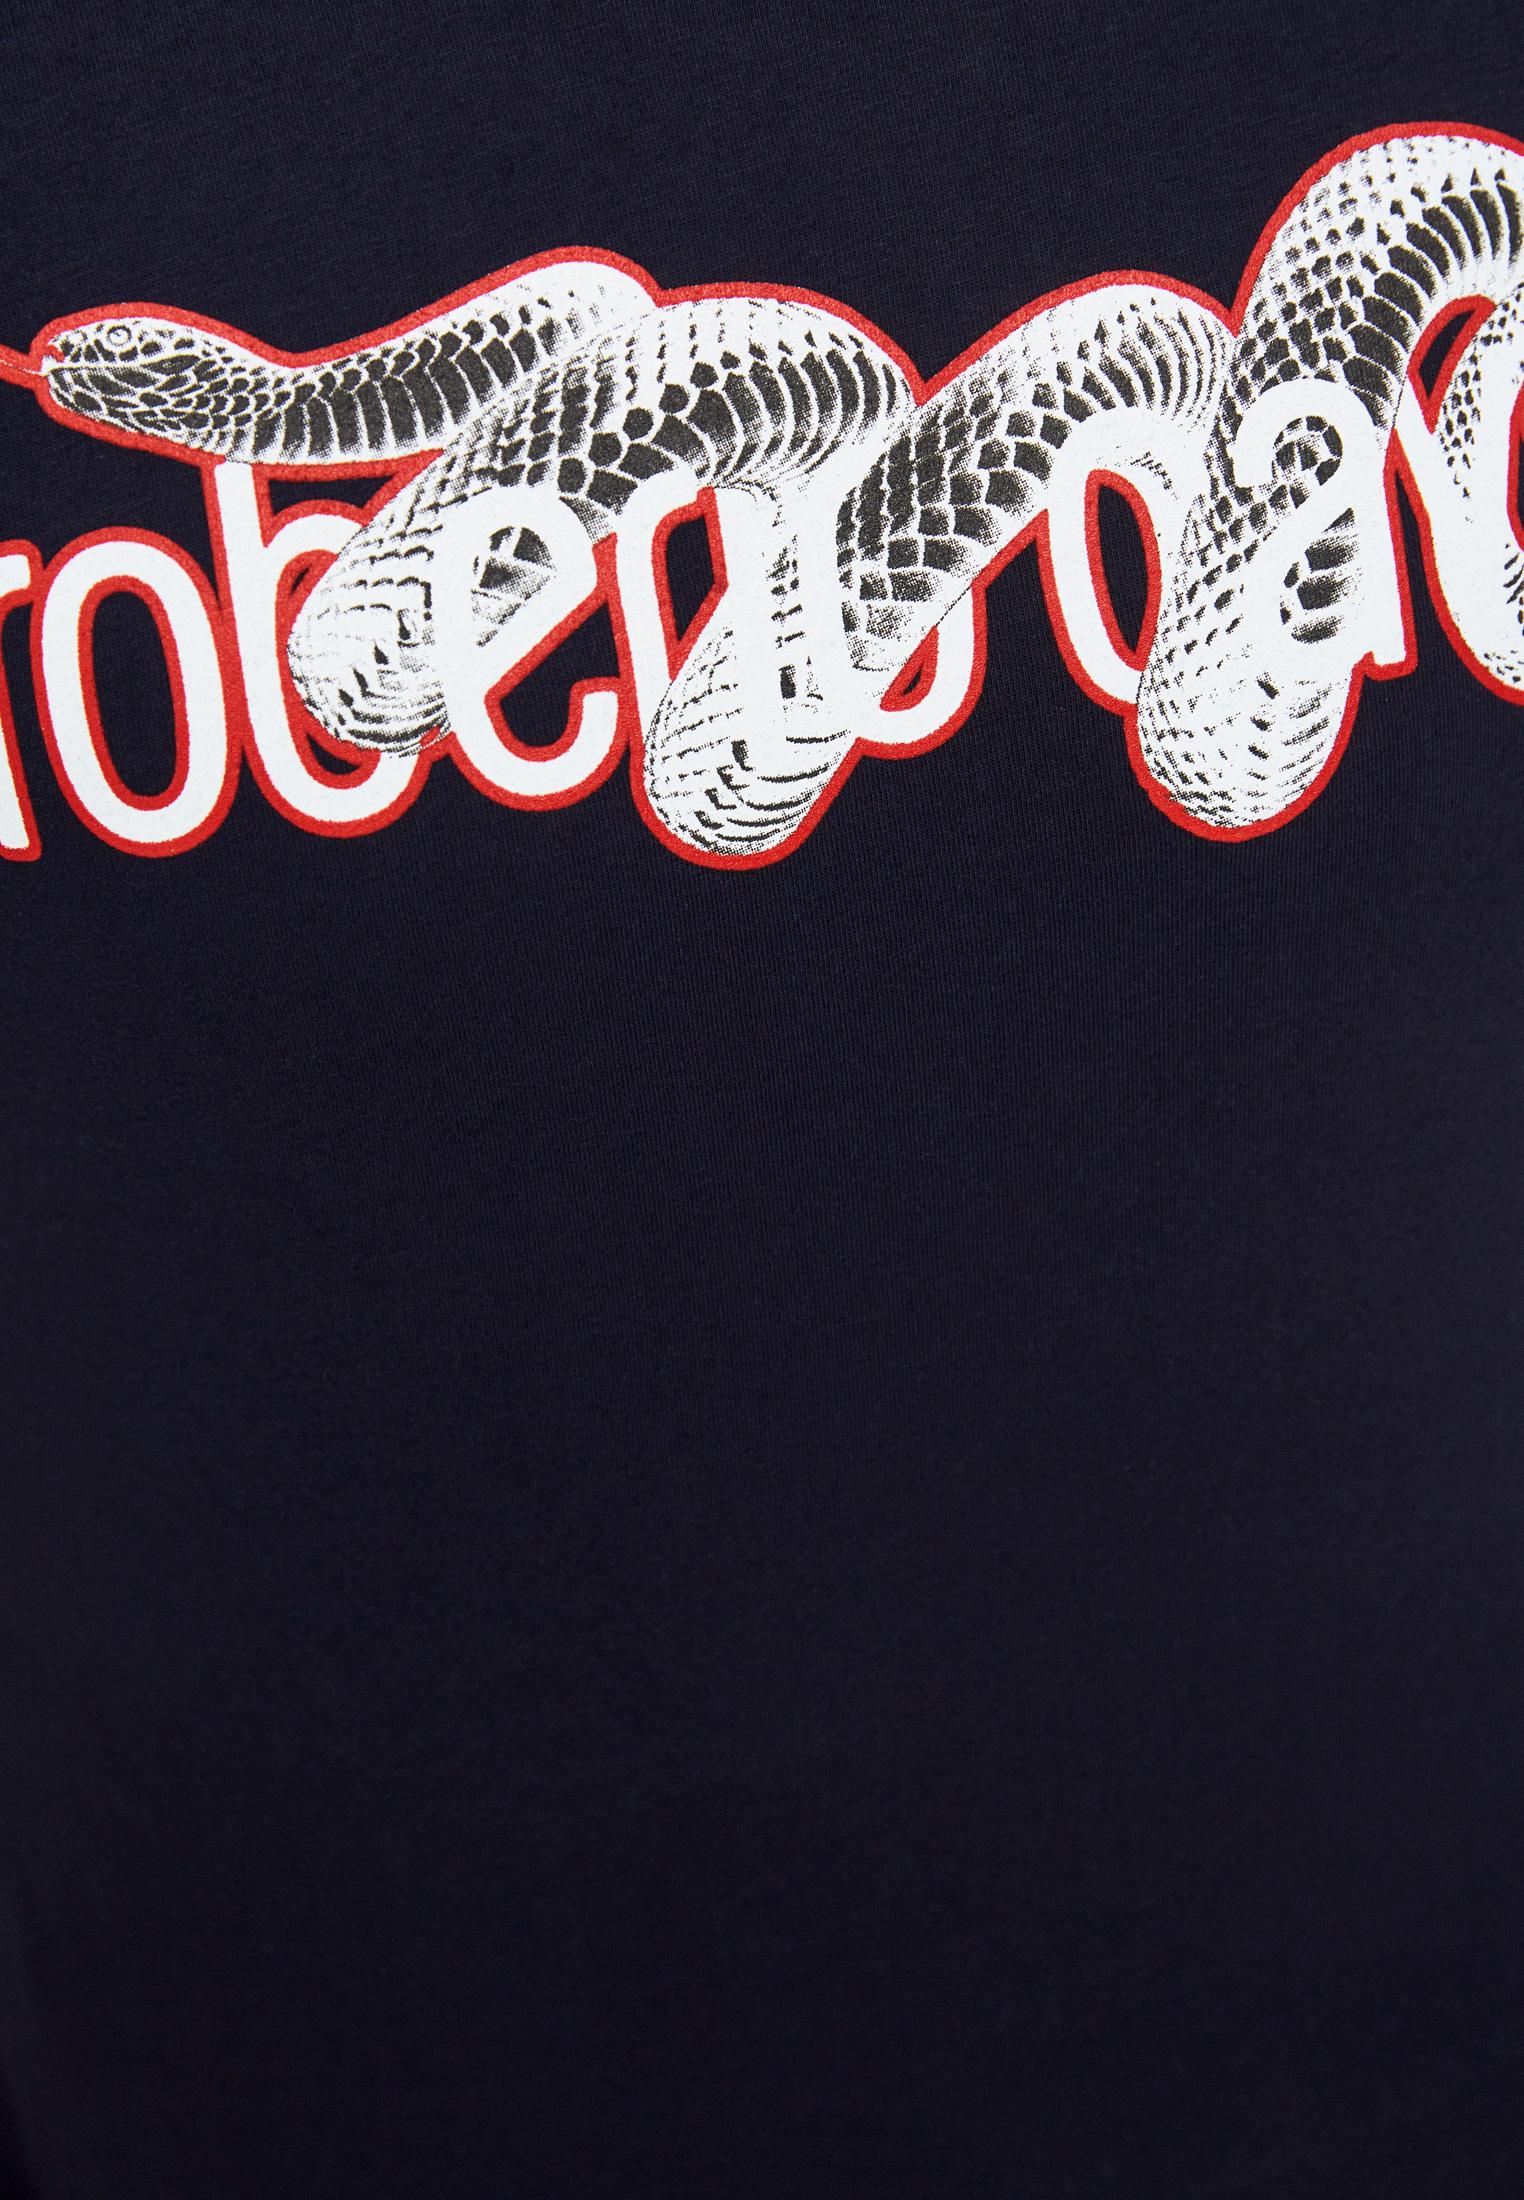 Мужская футболка Roberto Cavalli (Роберто Кавалли) GST655A027: изображение 10